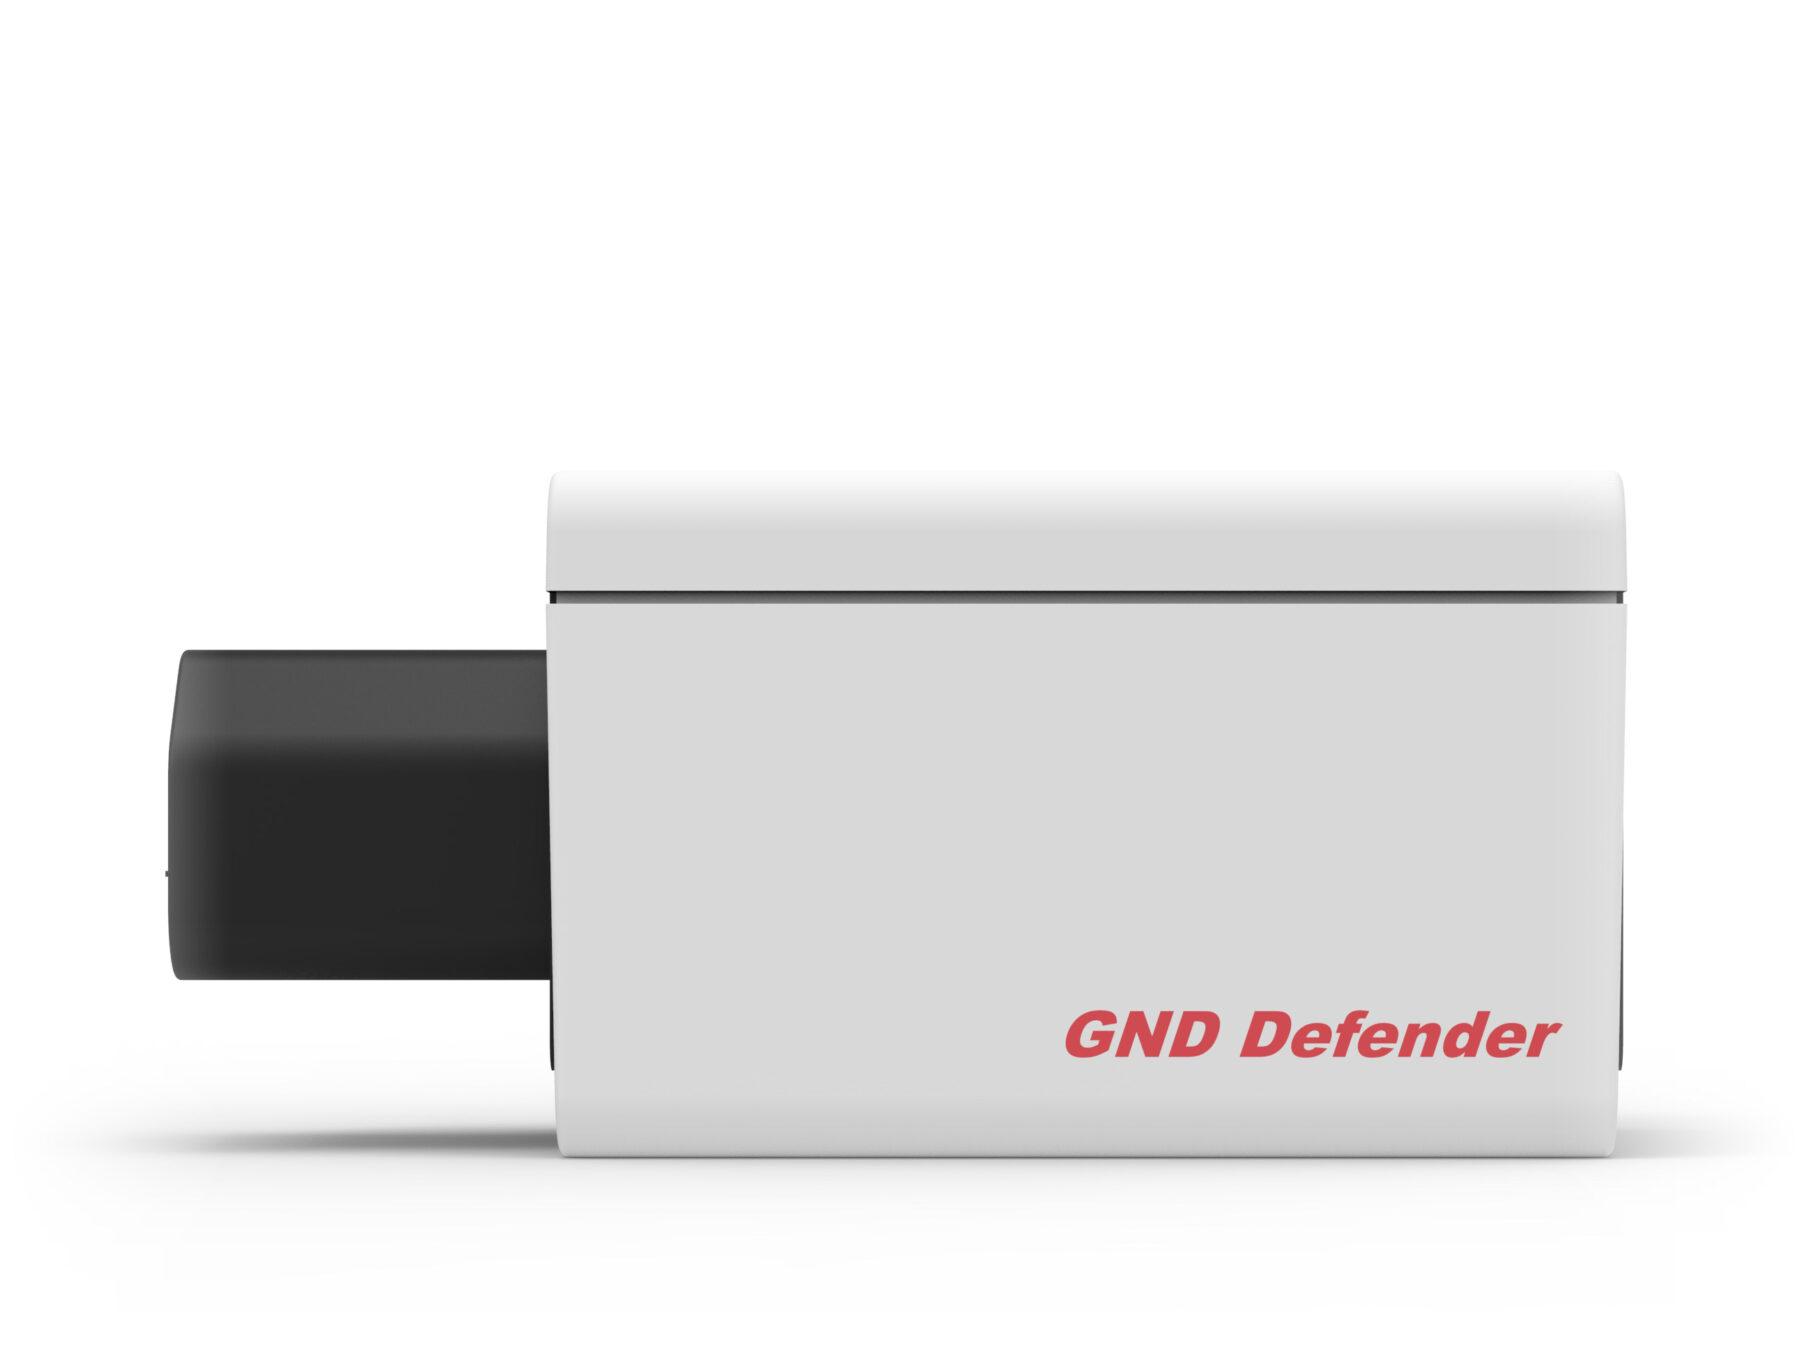 iFi GND Defender